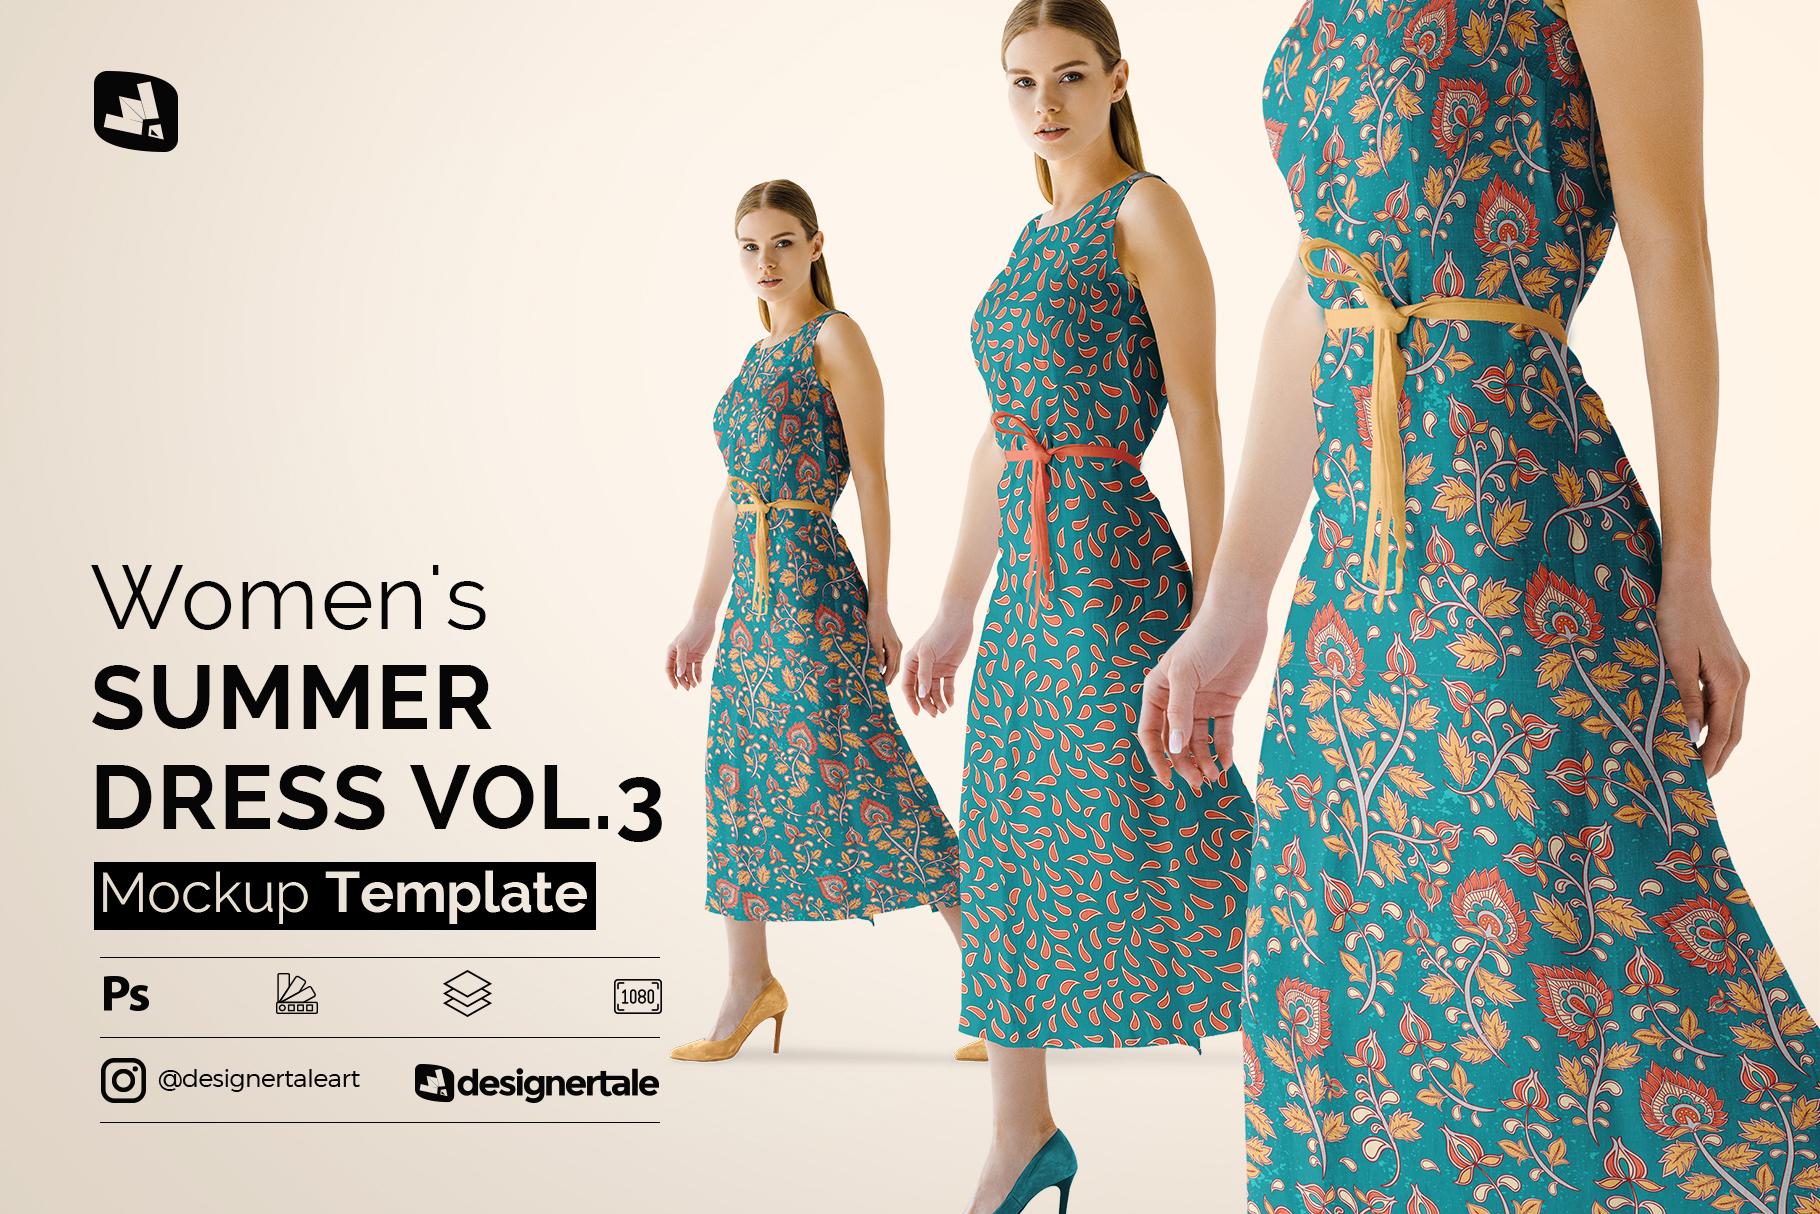 women's summer dress mockup vol.3